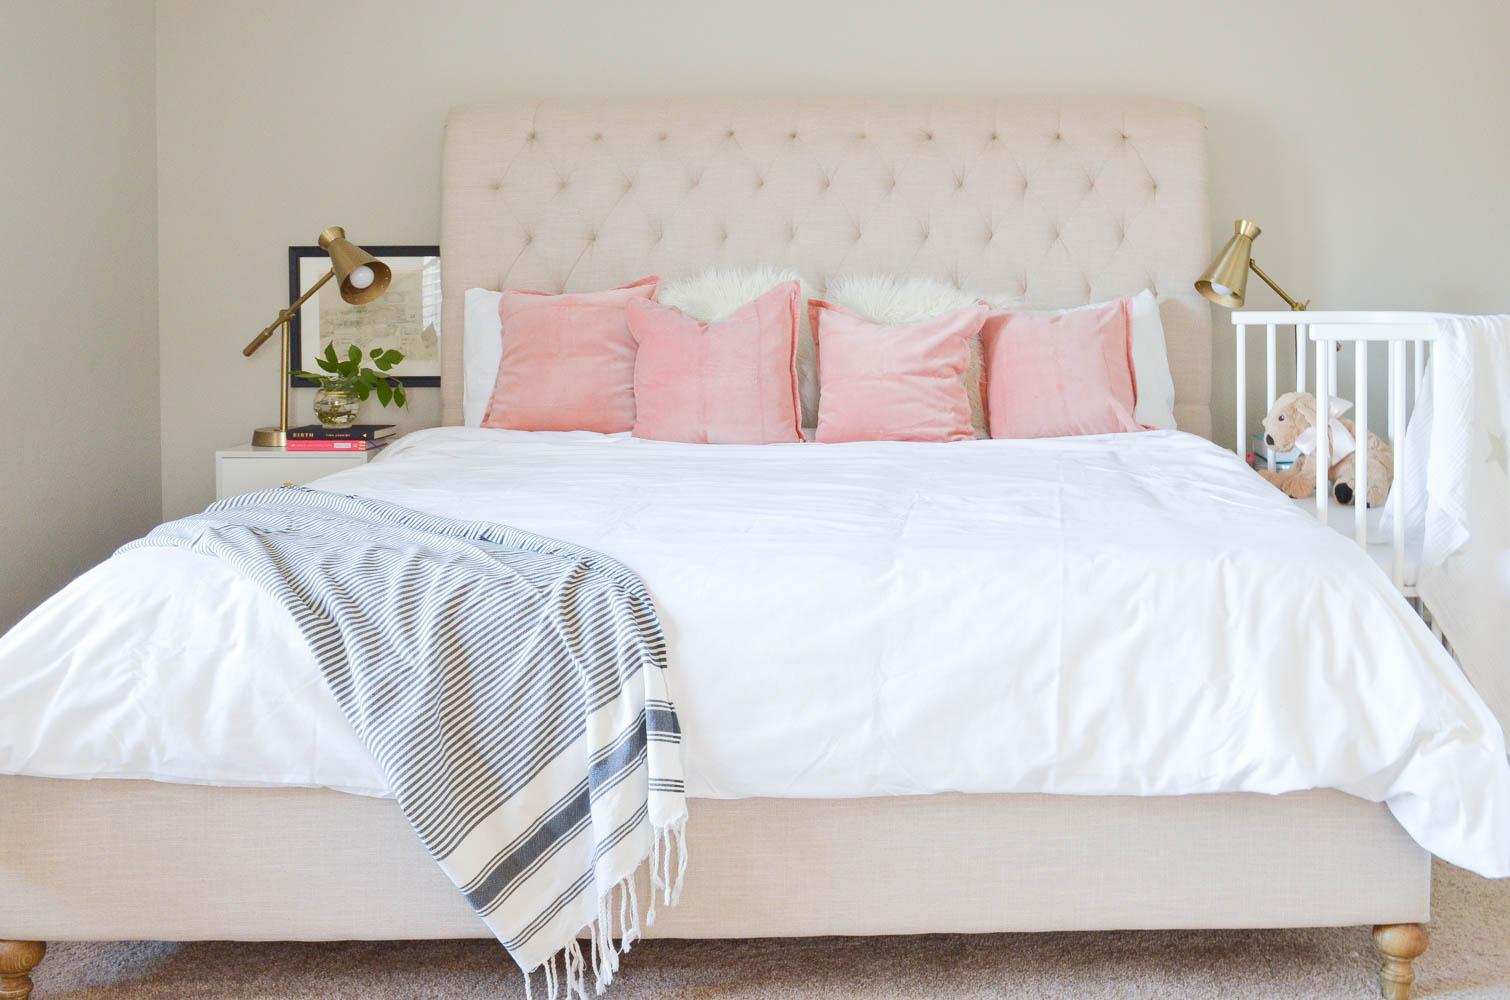 Master Bedroom | CoSleeping Bedroom | CoSleeping | Newborn | Night Stand